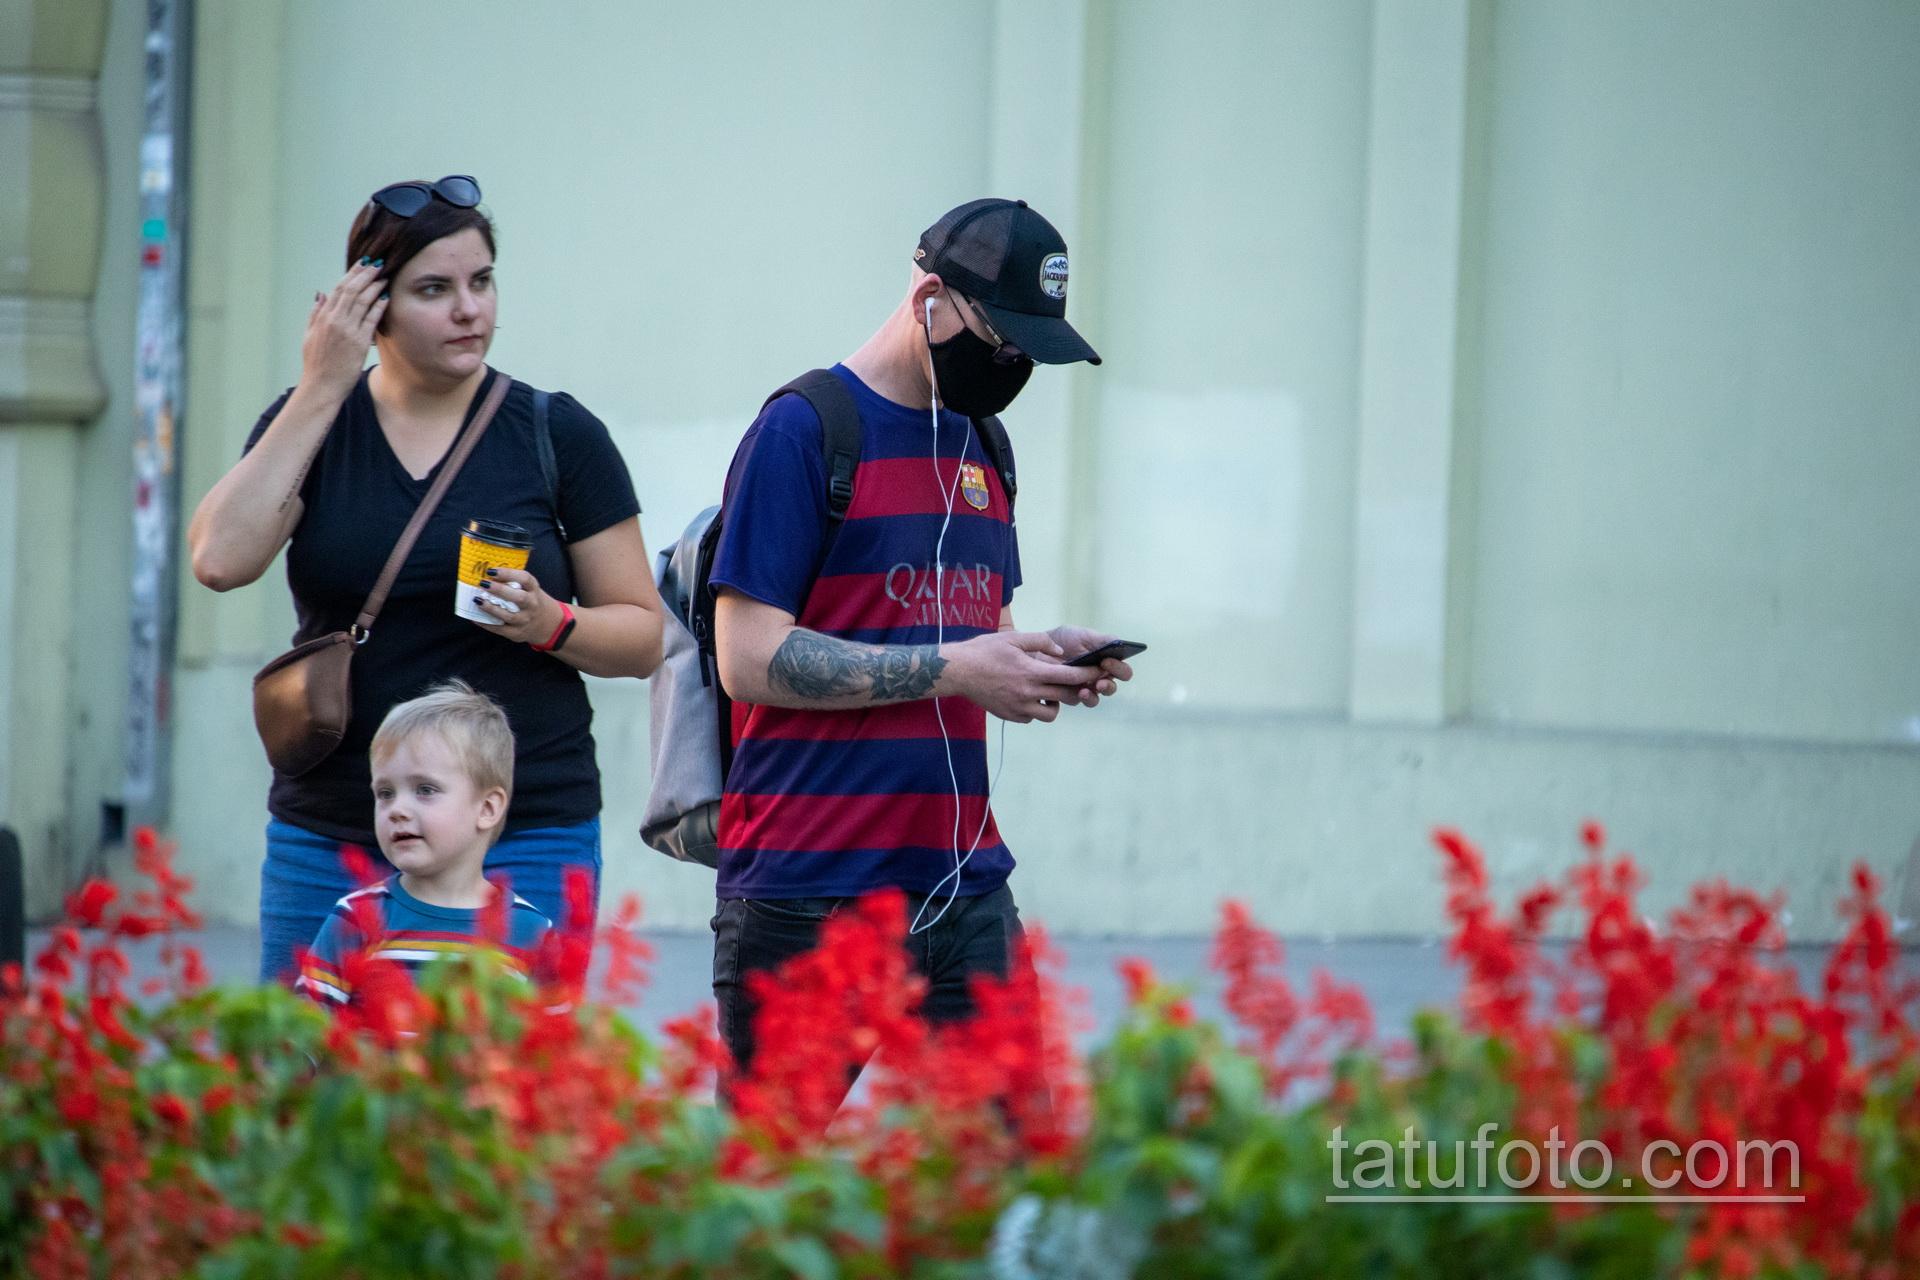 Тату девушка Санта Муэрто и роза на руке парня – Уличная татуировка 14.09.2020 – tatufoto.com 3